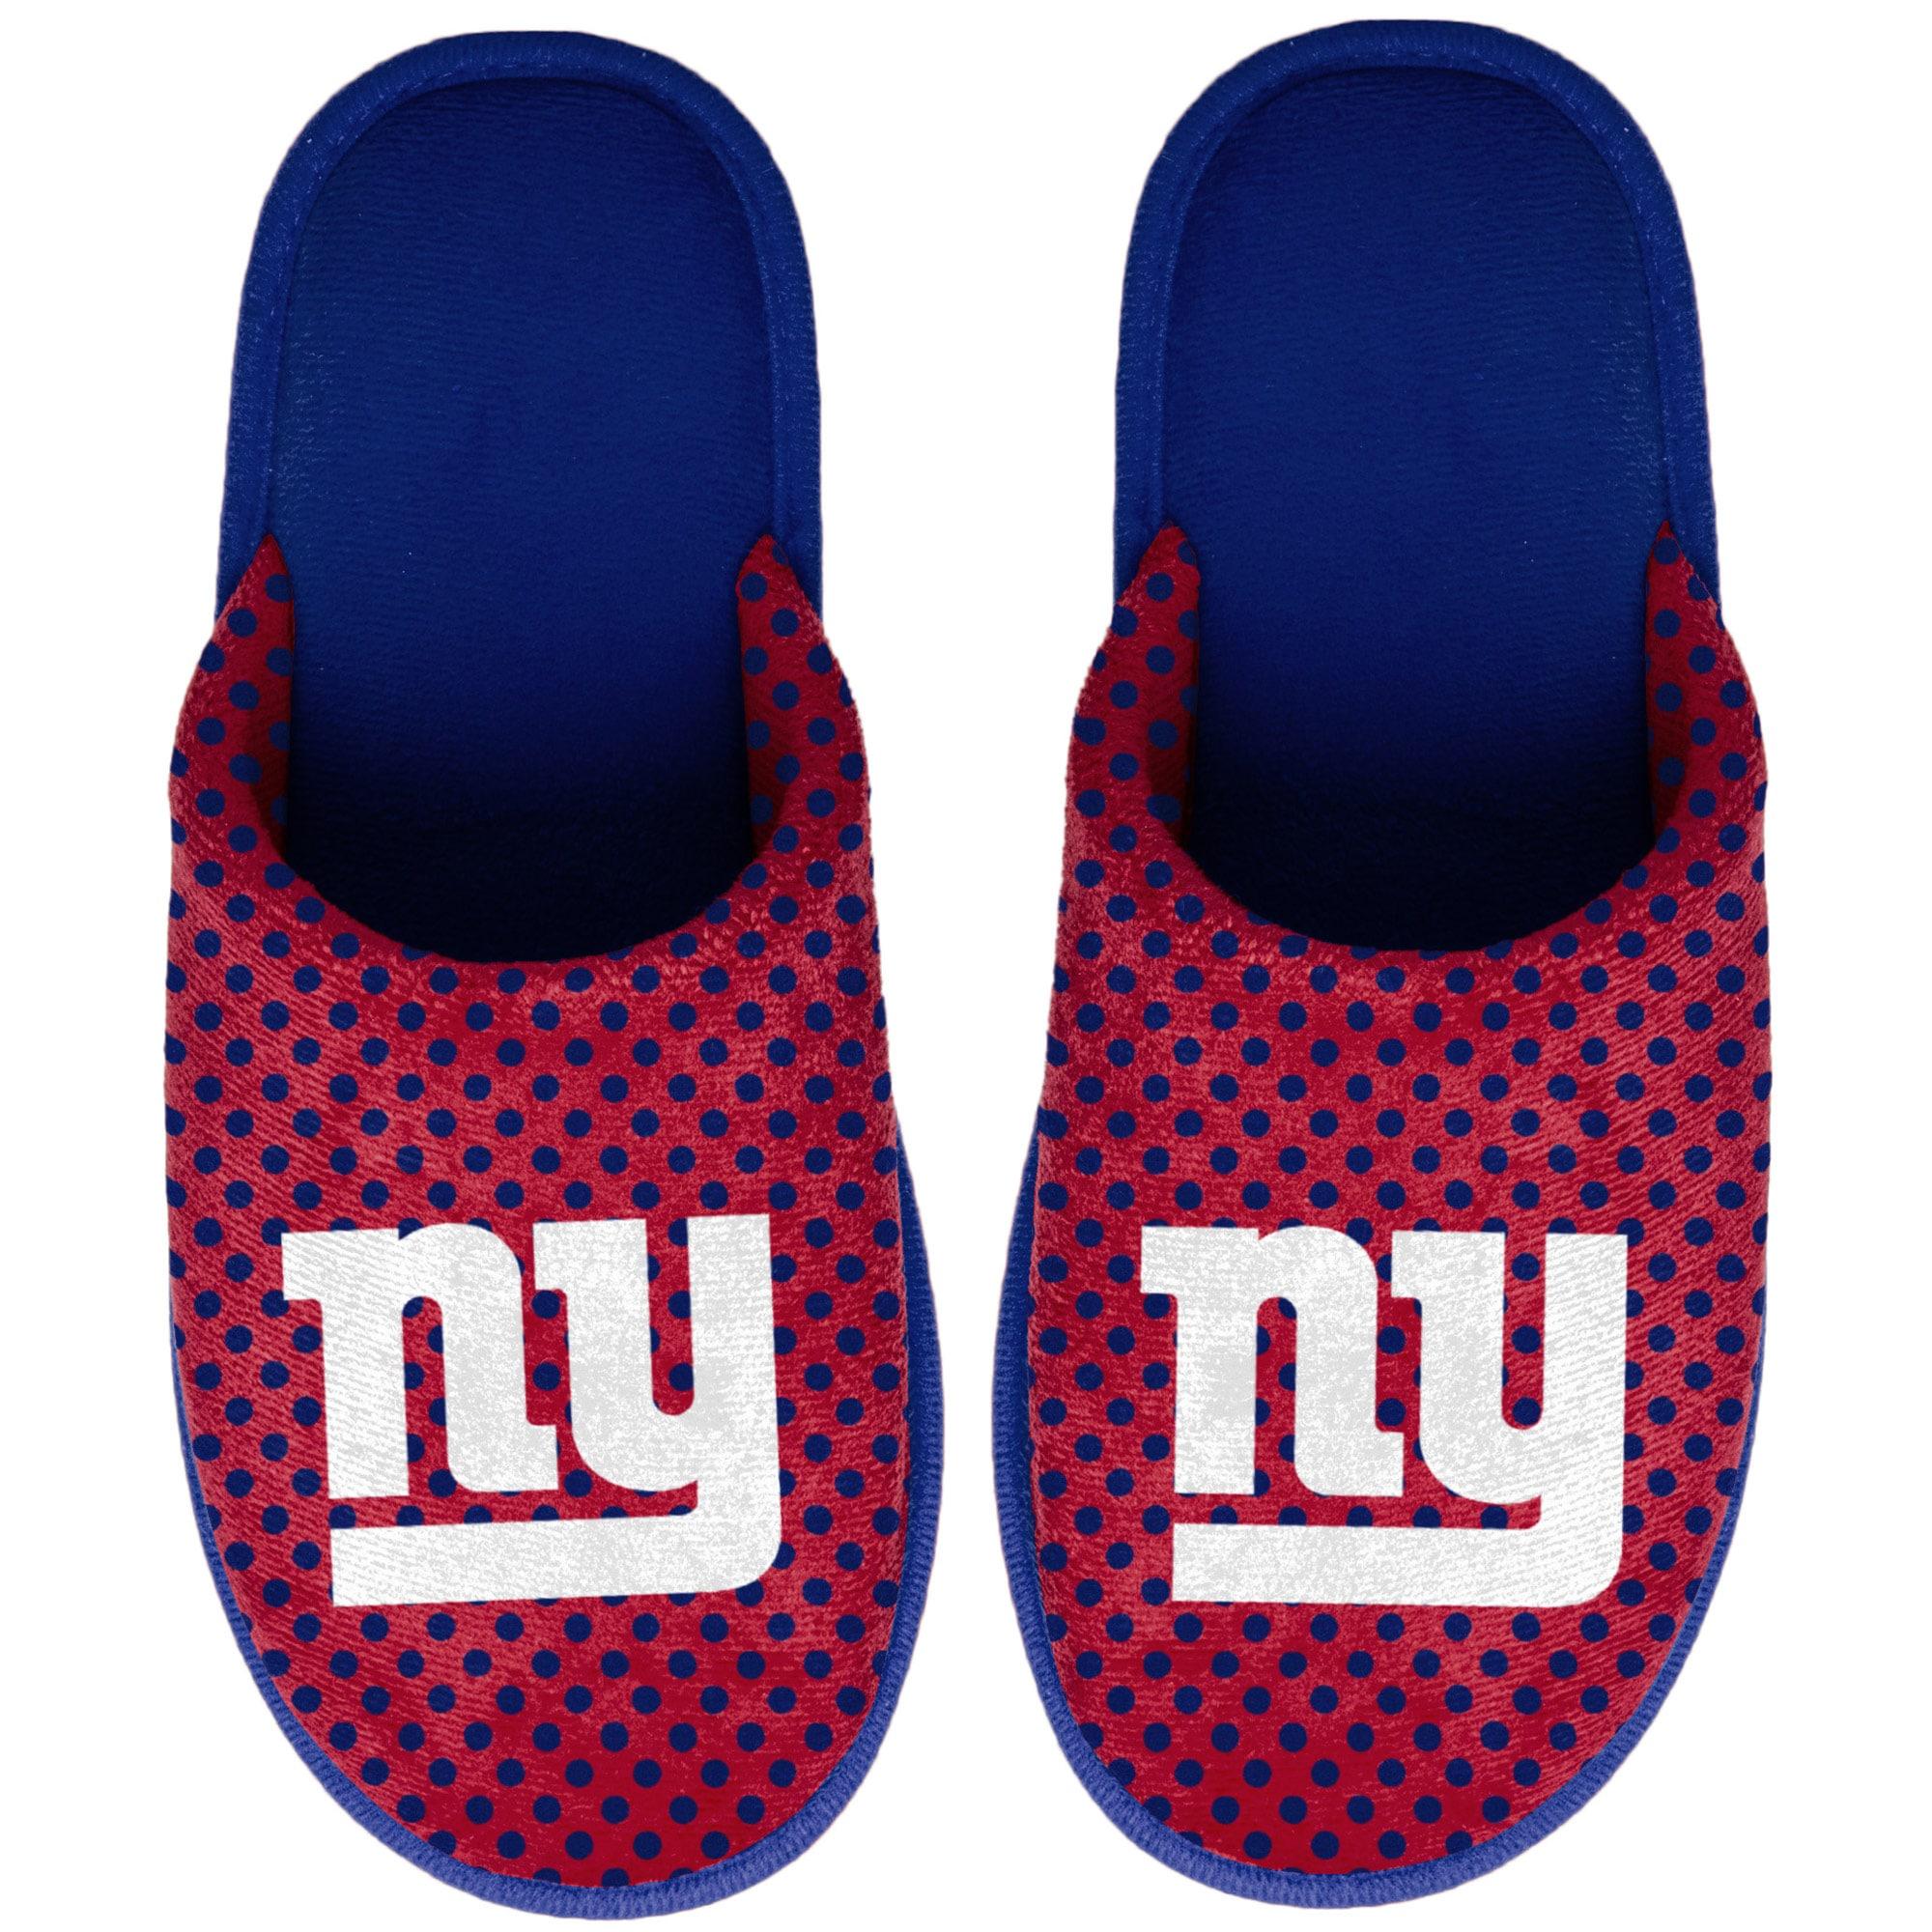 New York Giants Women's Big Logo Scuff Slippers